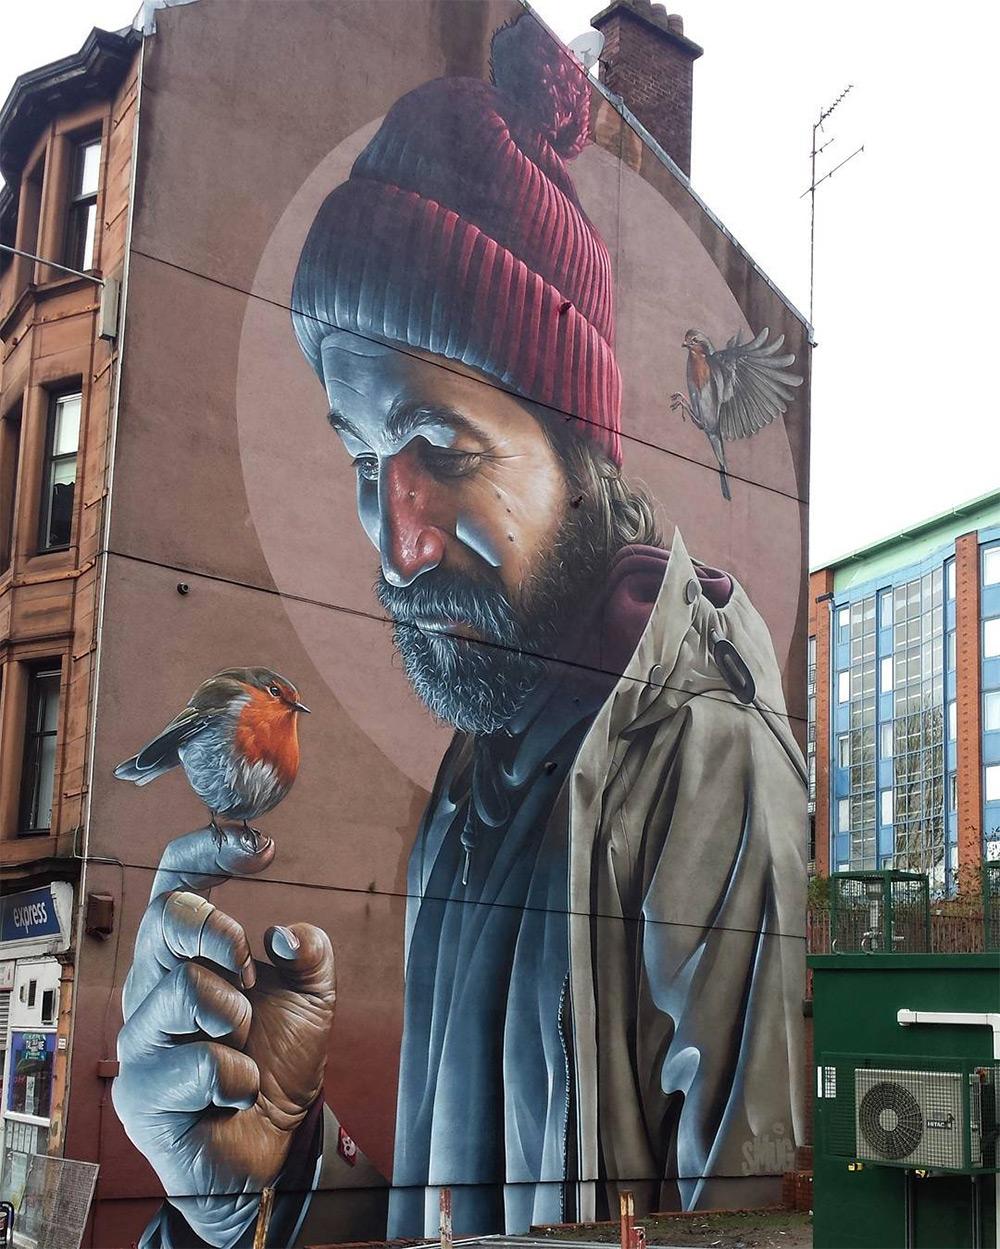 street-art-sam-bates-smug-glasgow-1